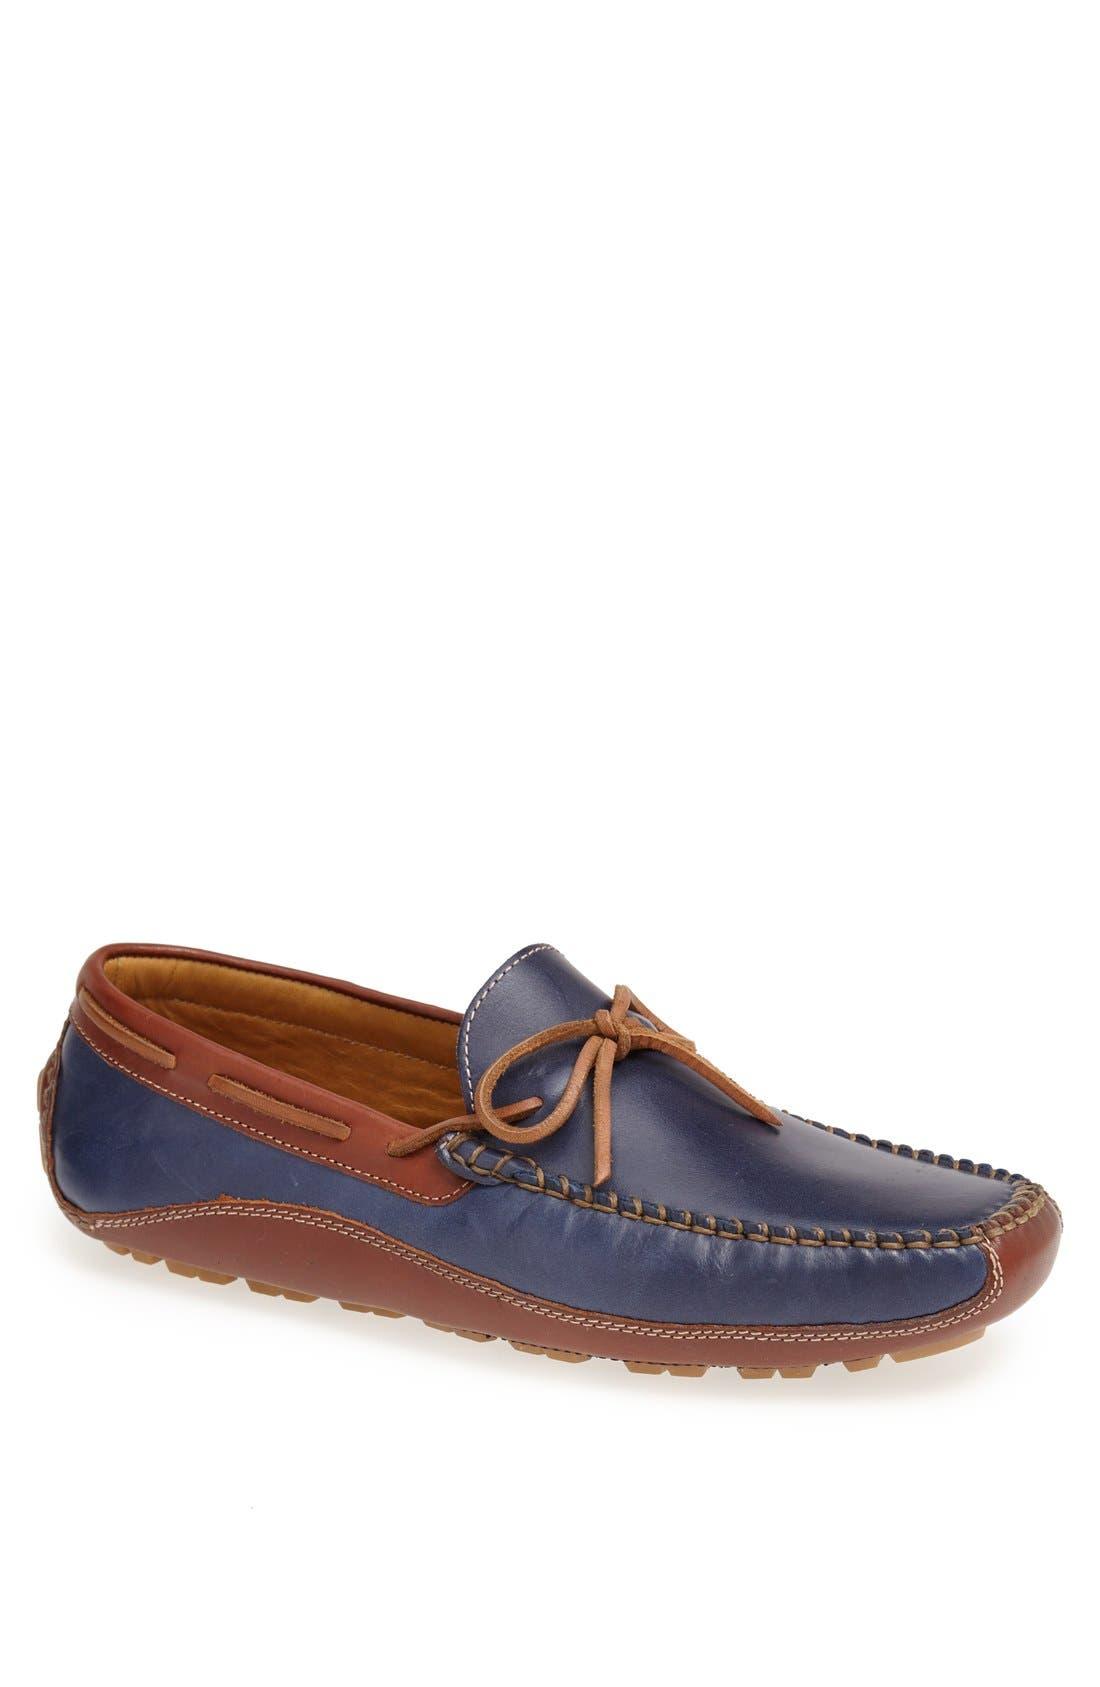 'Drake' Leather Driving Shoe,                             Main thumbnail 10, color,